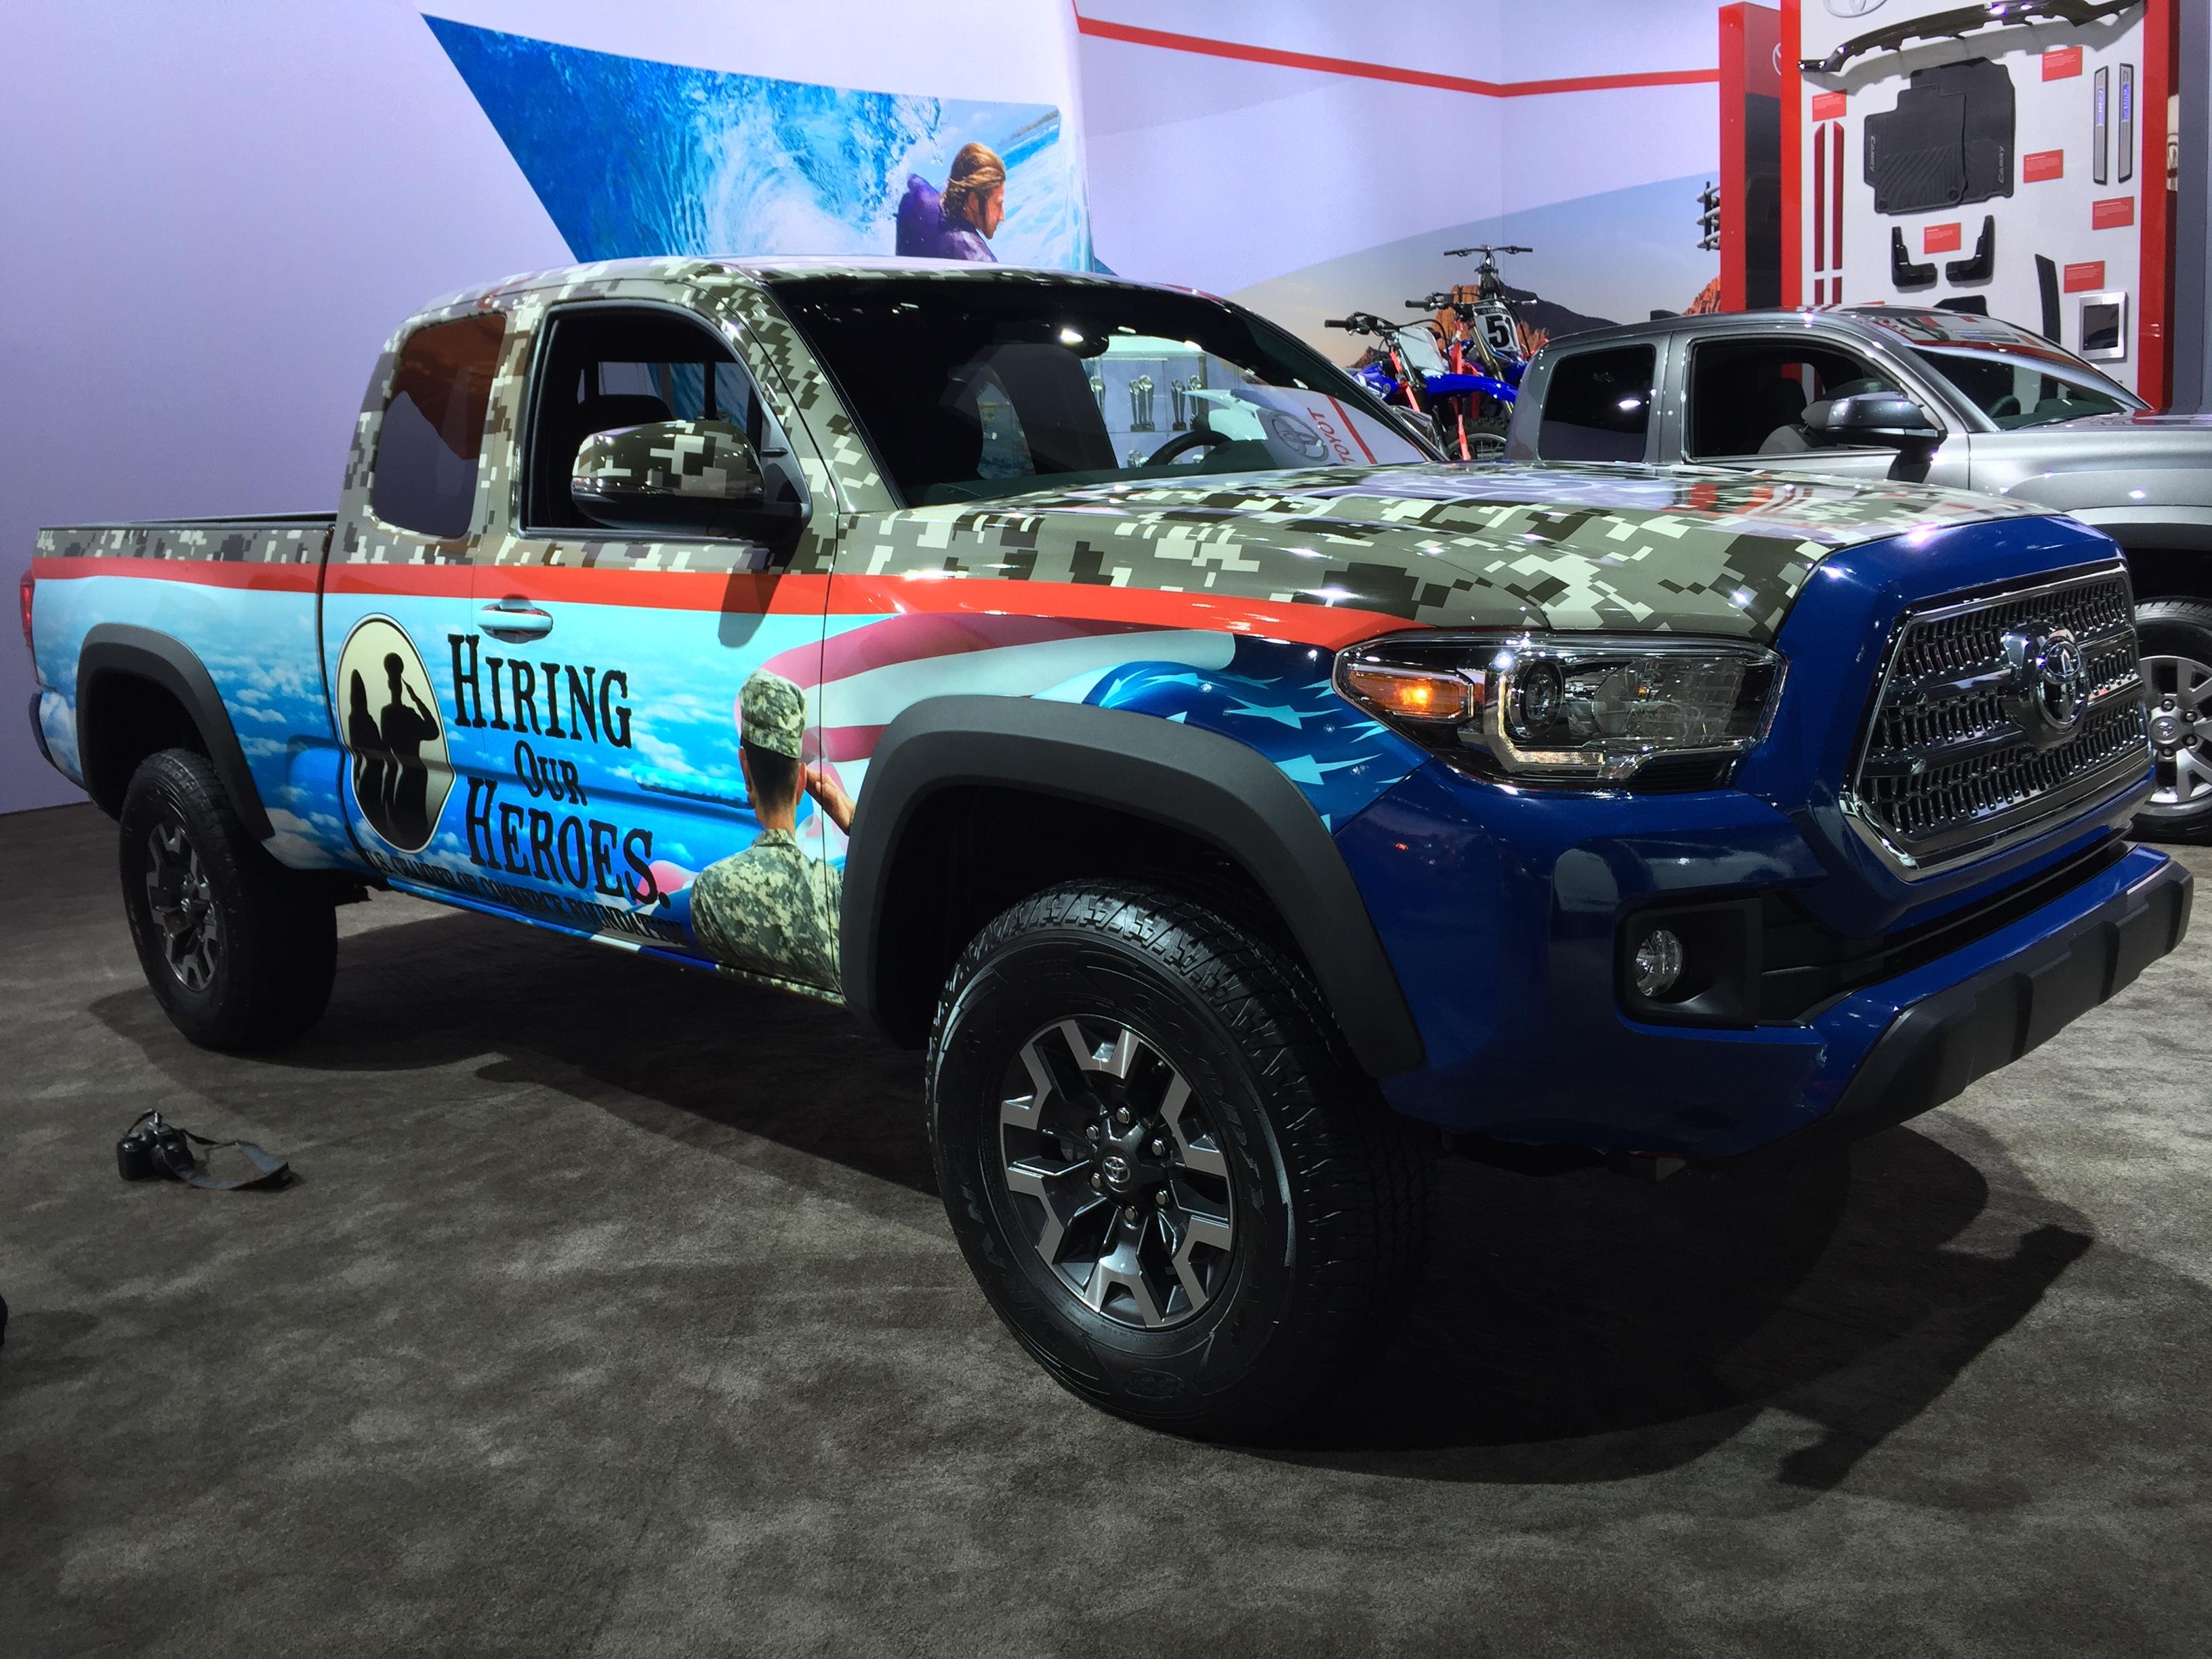 Toyota Alexandria La New Car Release Information